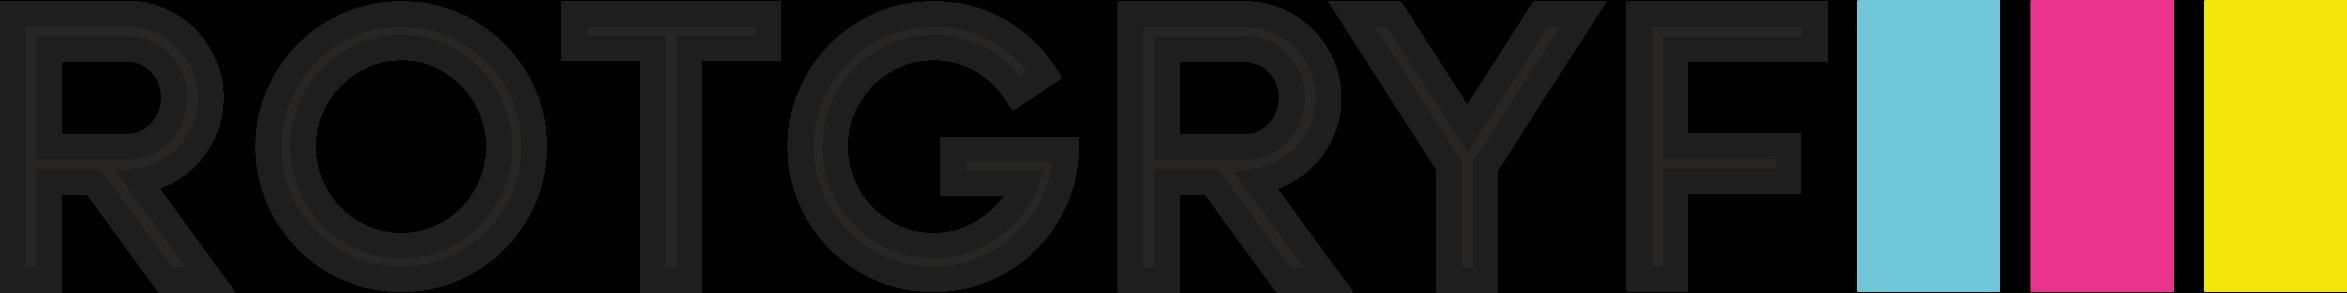 Drukarnia Rotgryf